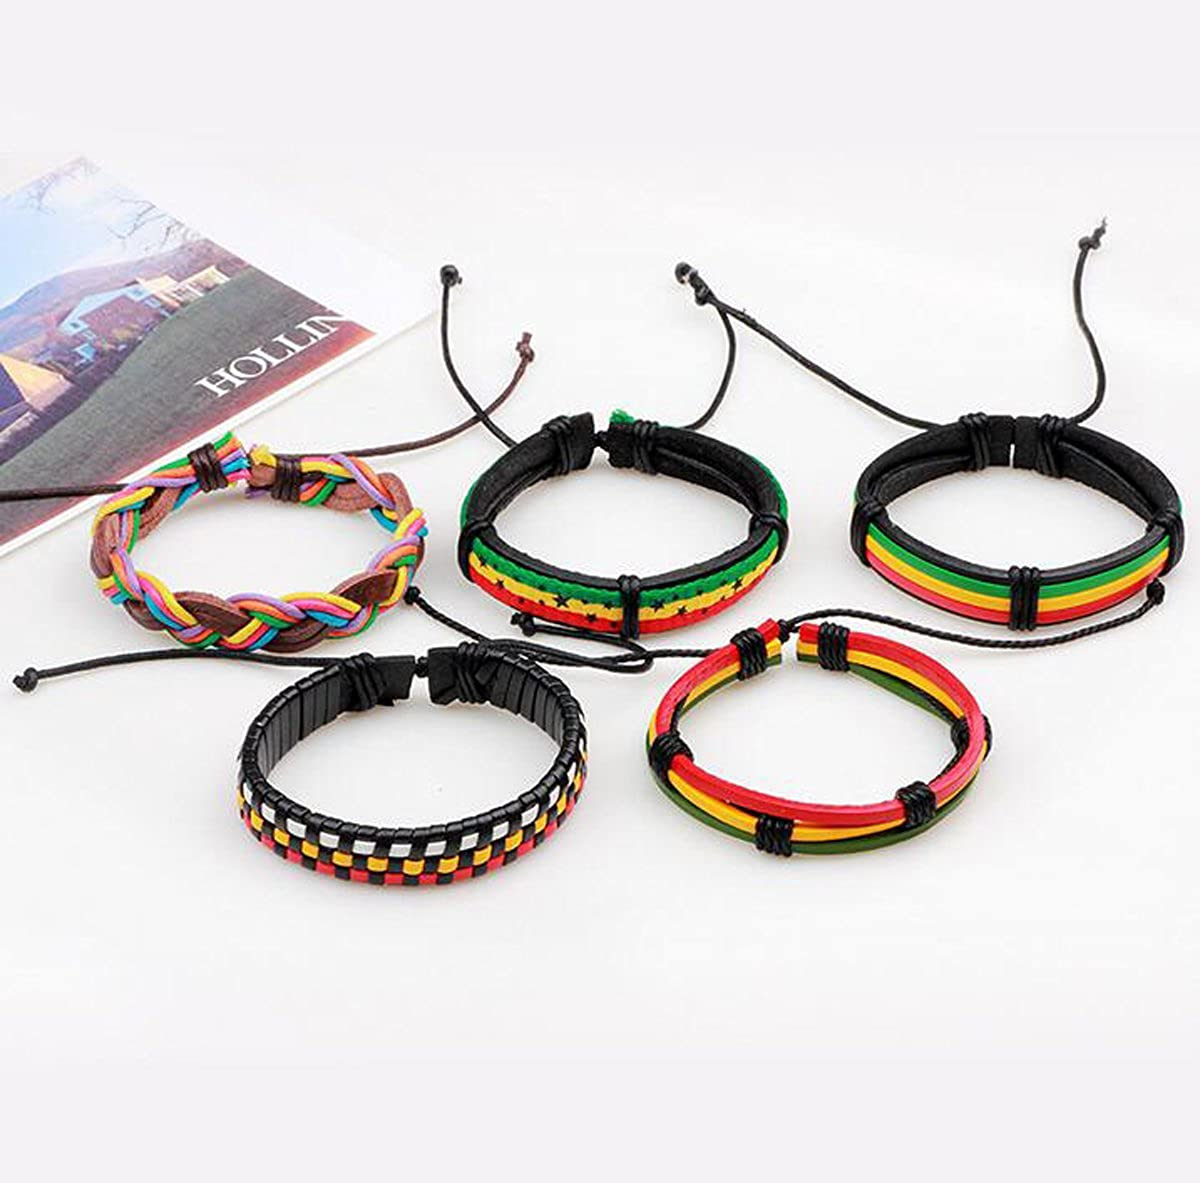 Titansten 5PCS Leather Handmade Diy Colorful Wax Rope Woven Bracelet Stackable Wristband Women /& Men